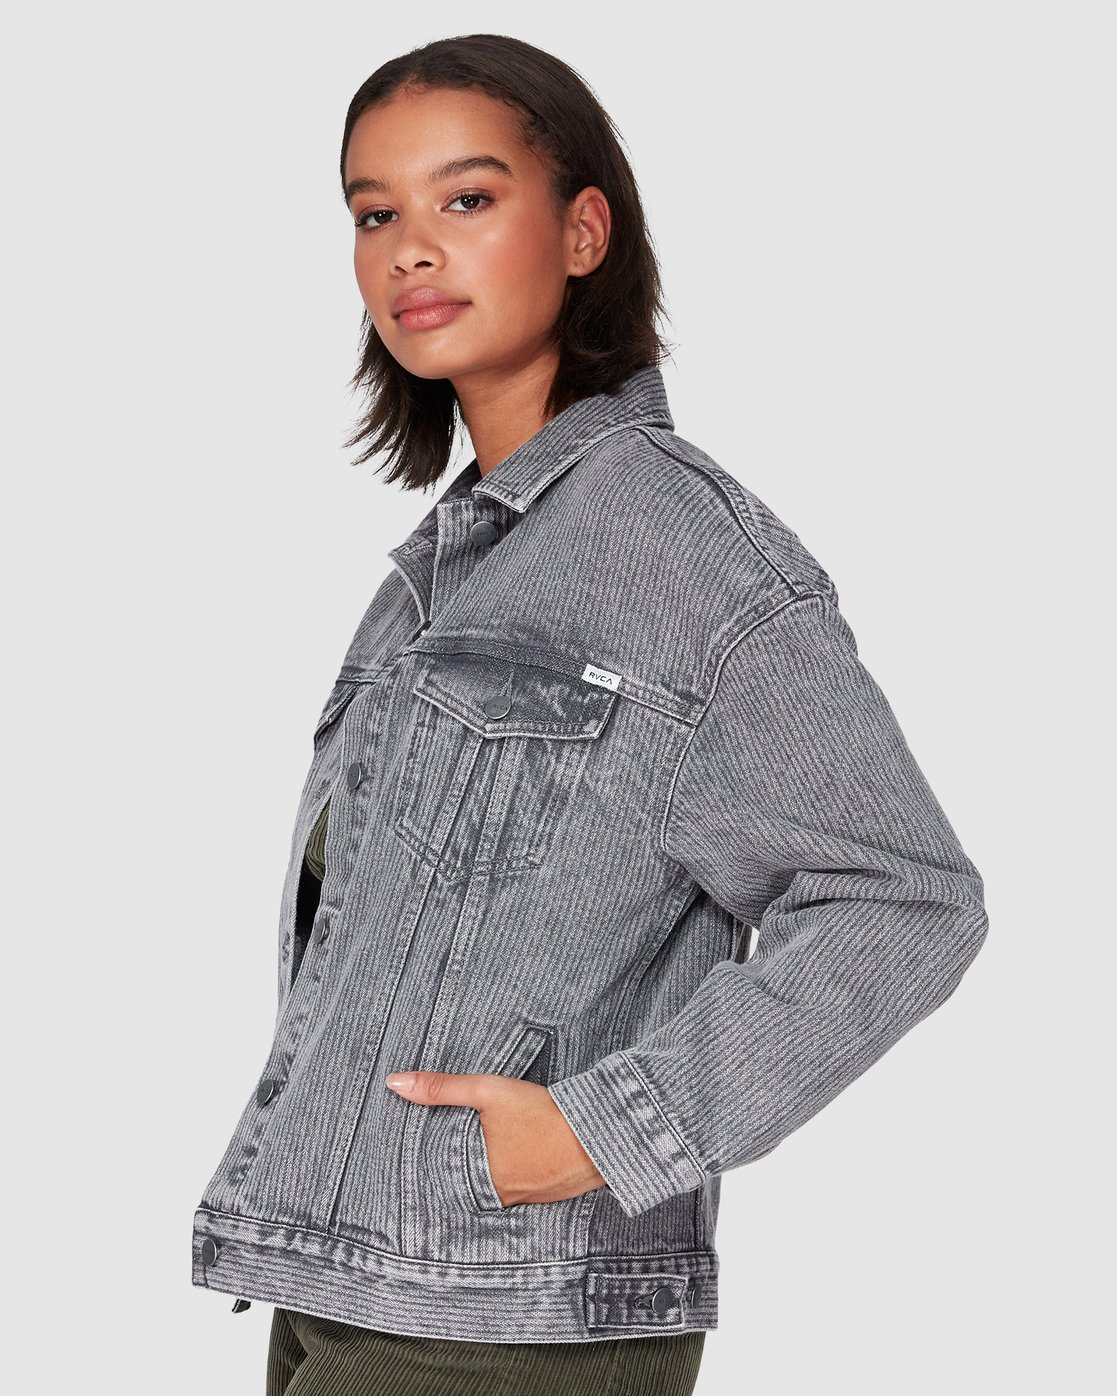 1 Slouch Dnm Jacket - Gry Stripe Grey R207440 RVCA